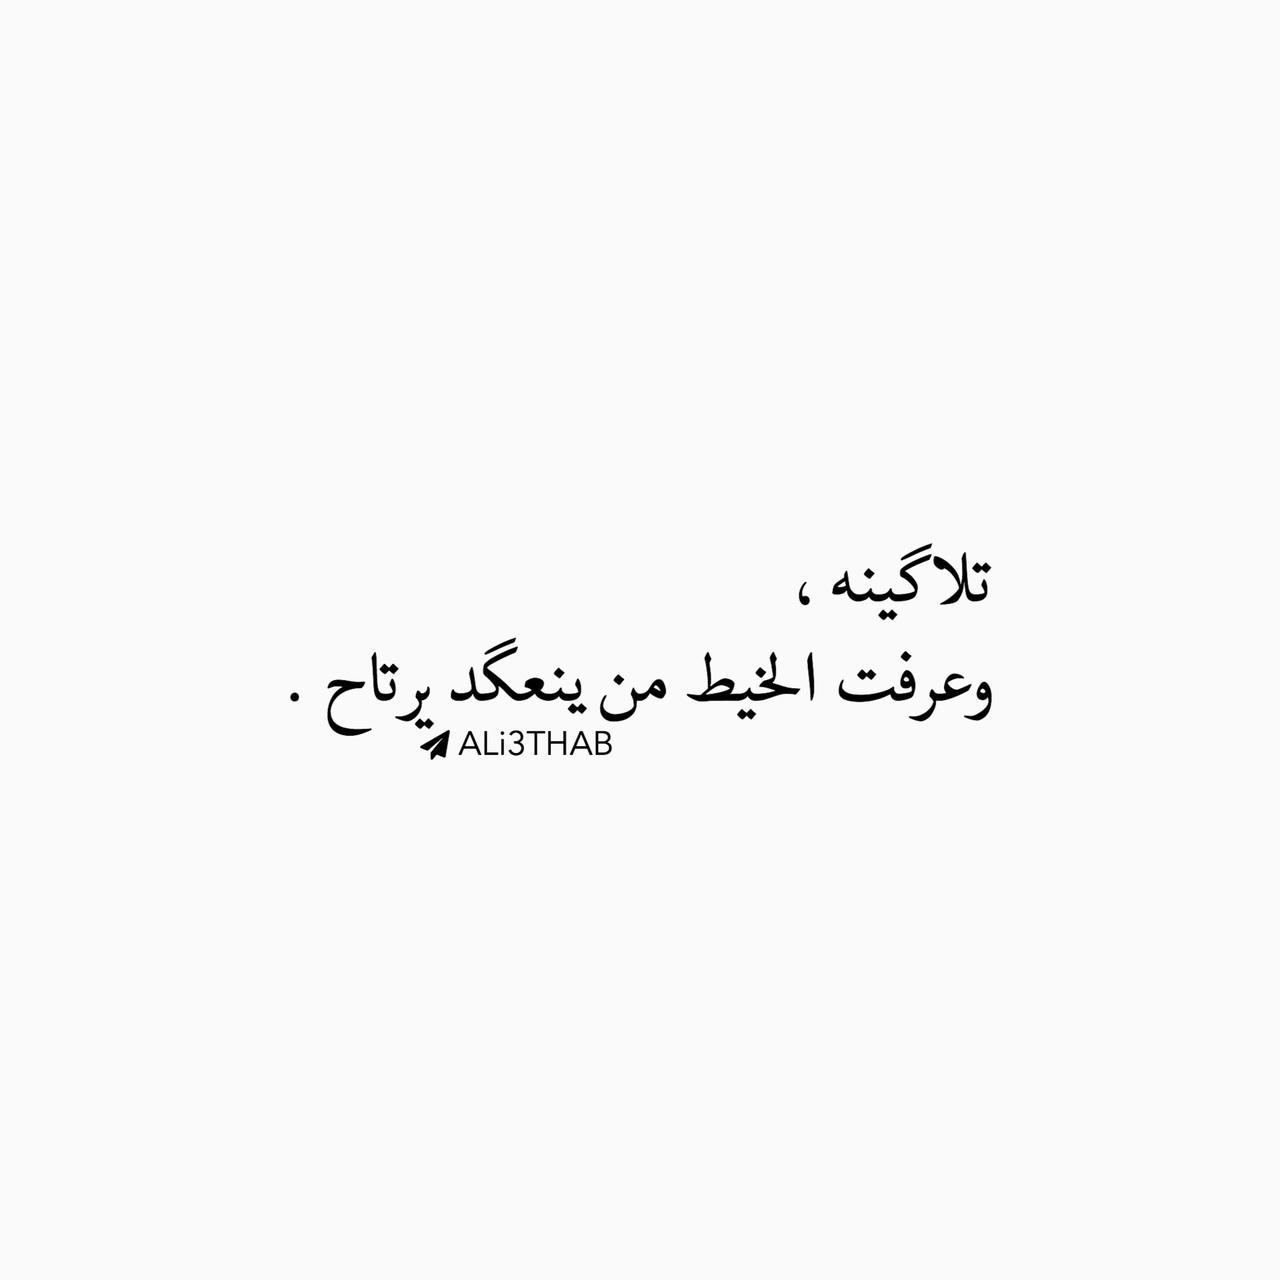 arabic, ﻋﺮﺑﻲ, and مقتبسه image